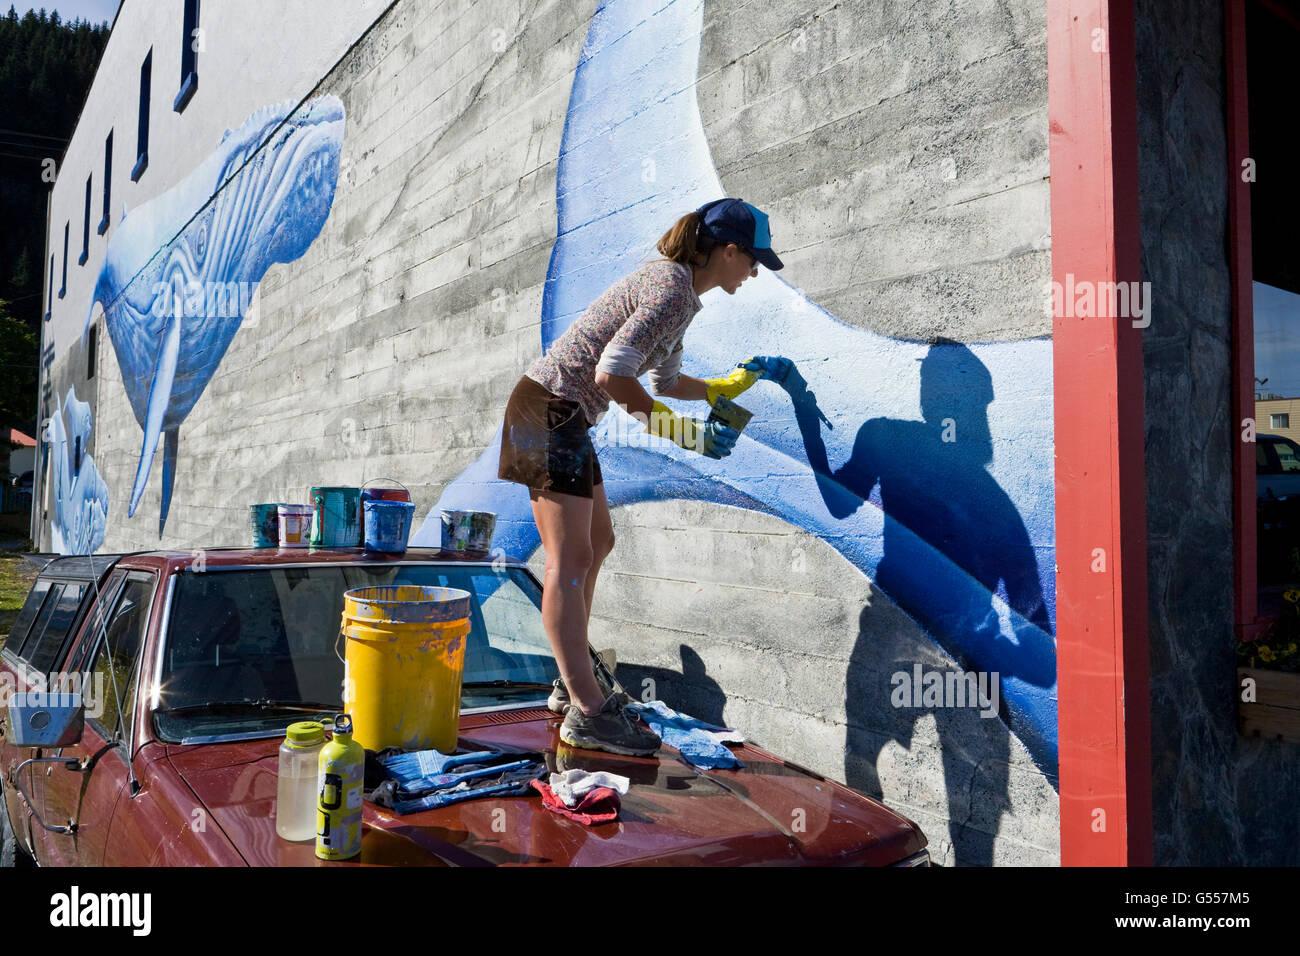 Artist Justine Pechuzal painting her mural 'Sea-ward Bound' depicting  humpback whales (Megaptera novaeangliae) - Stock Image